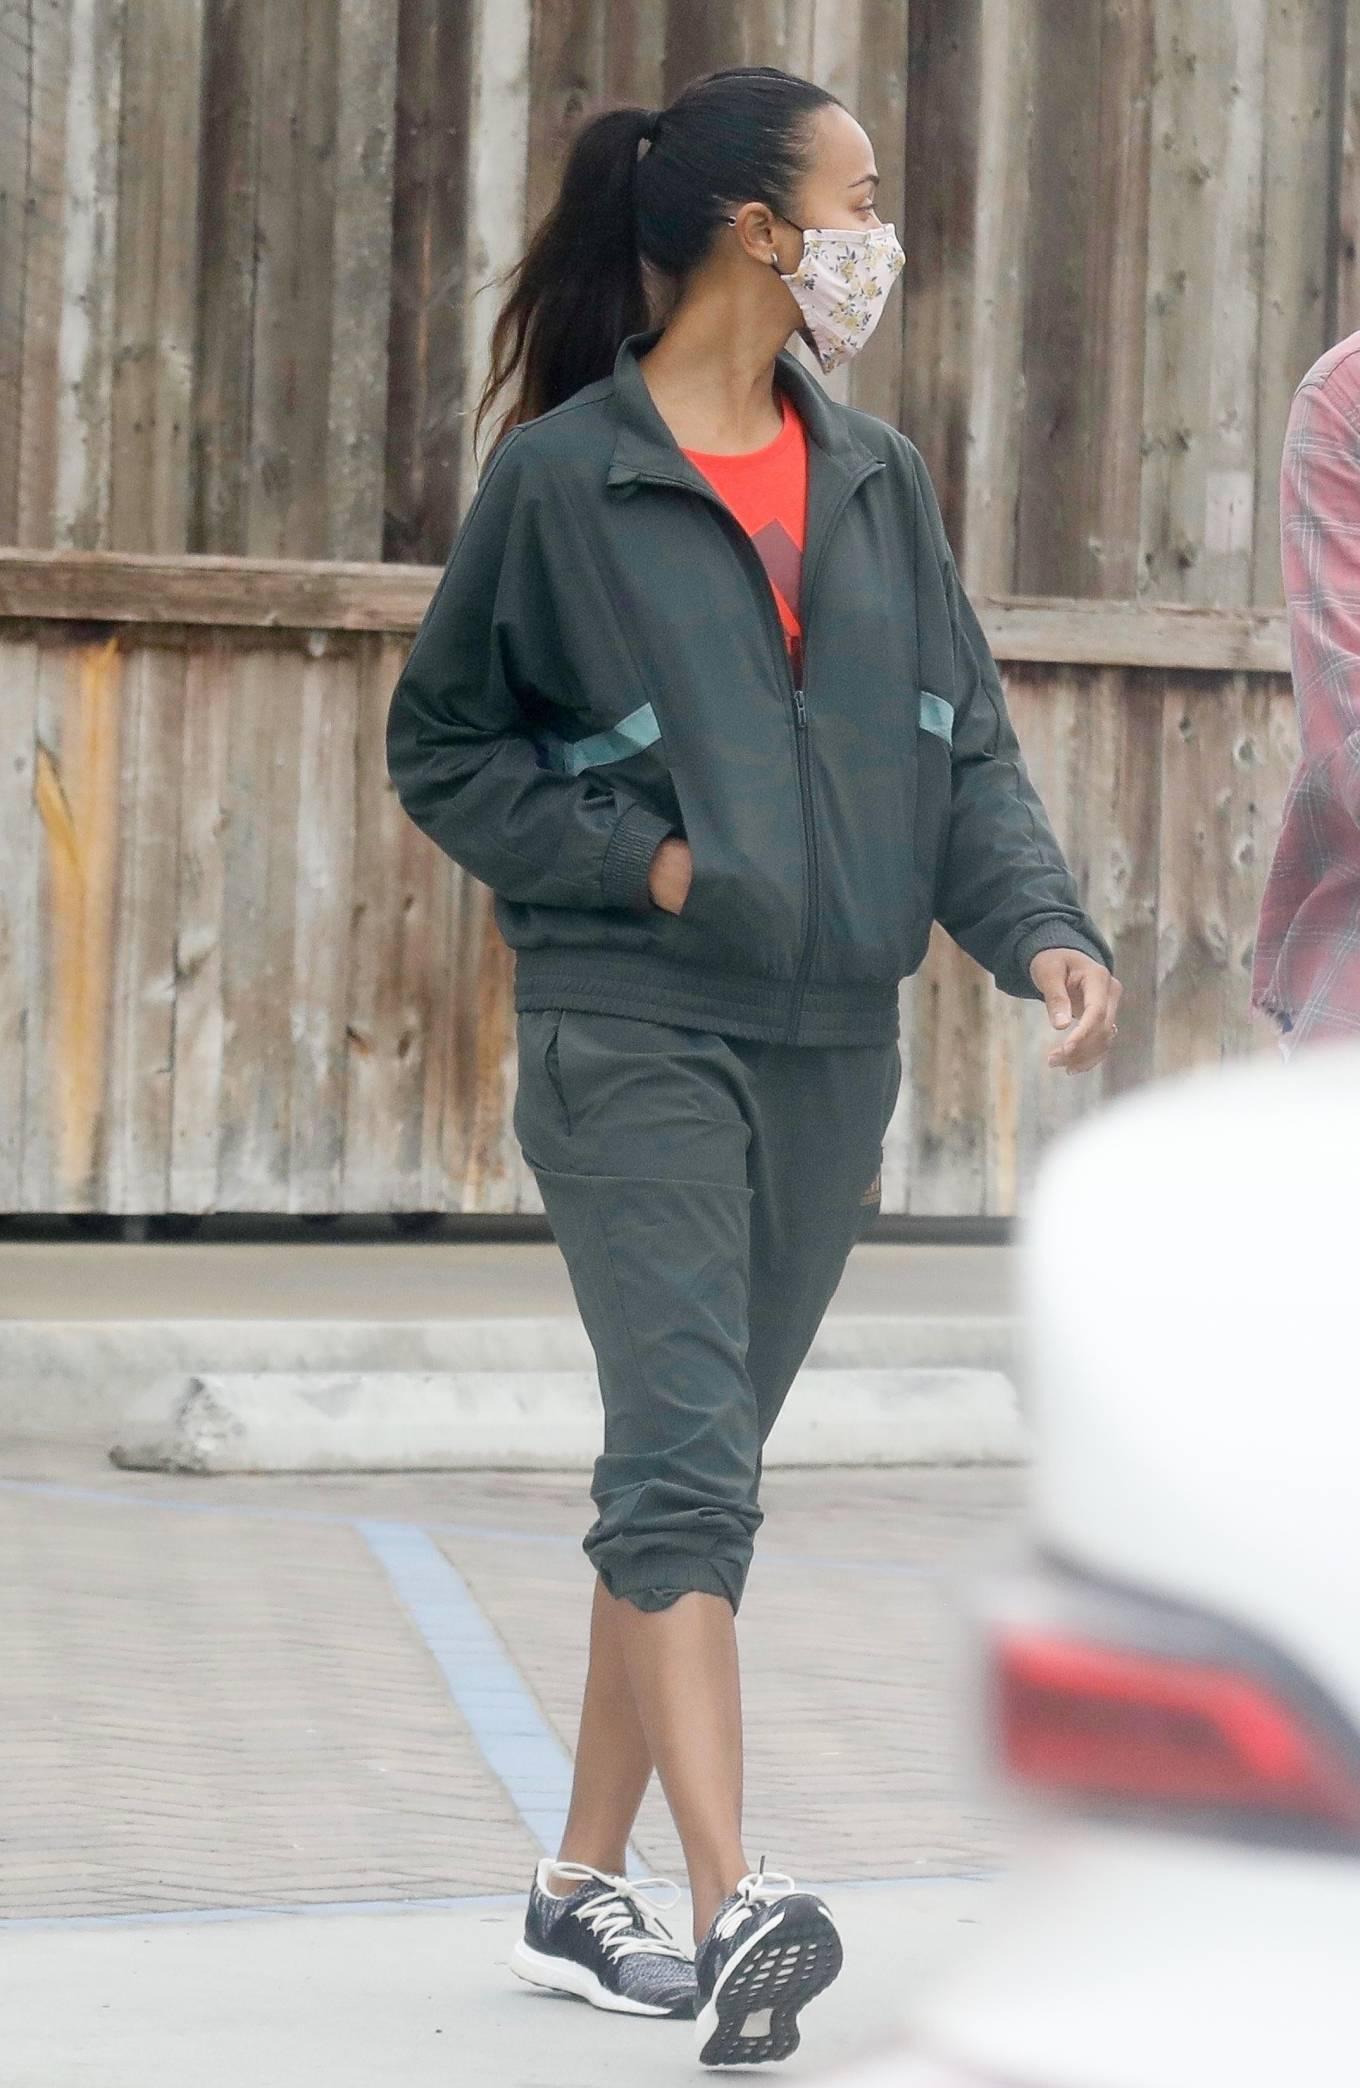 Zoe Saldana 2020 : Zoe Saldana with her her husband Marco Perego in Malibu-10